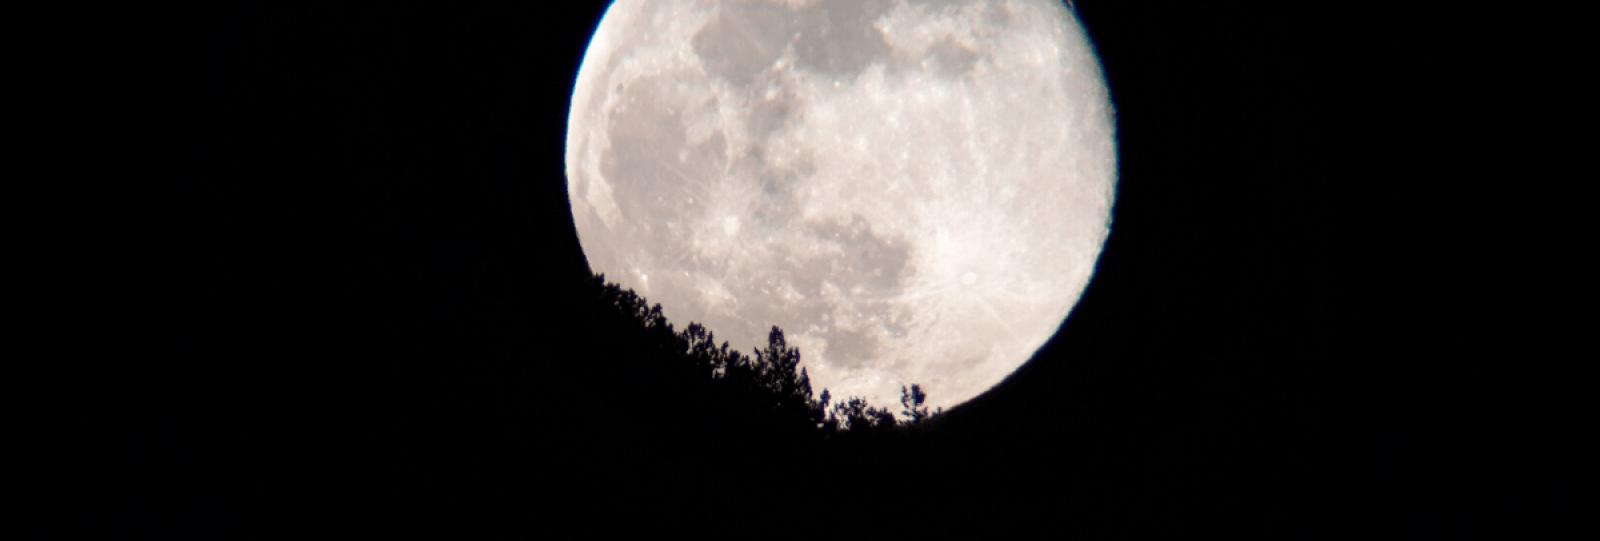 Balade sous la lune avec Christophe Pelet